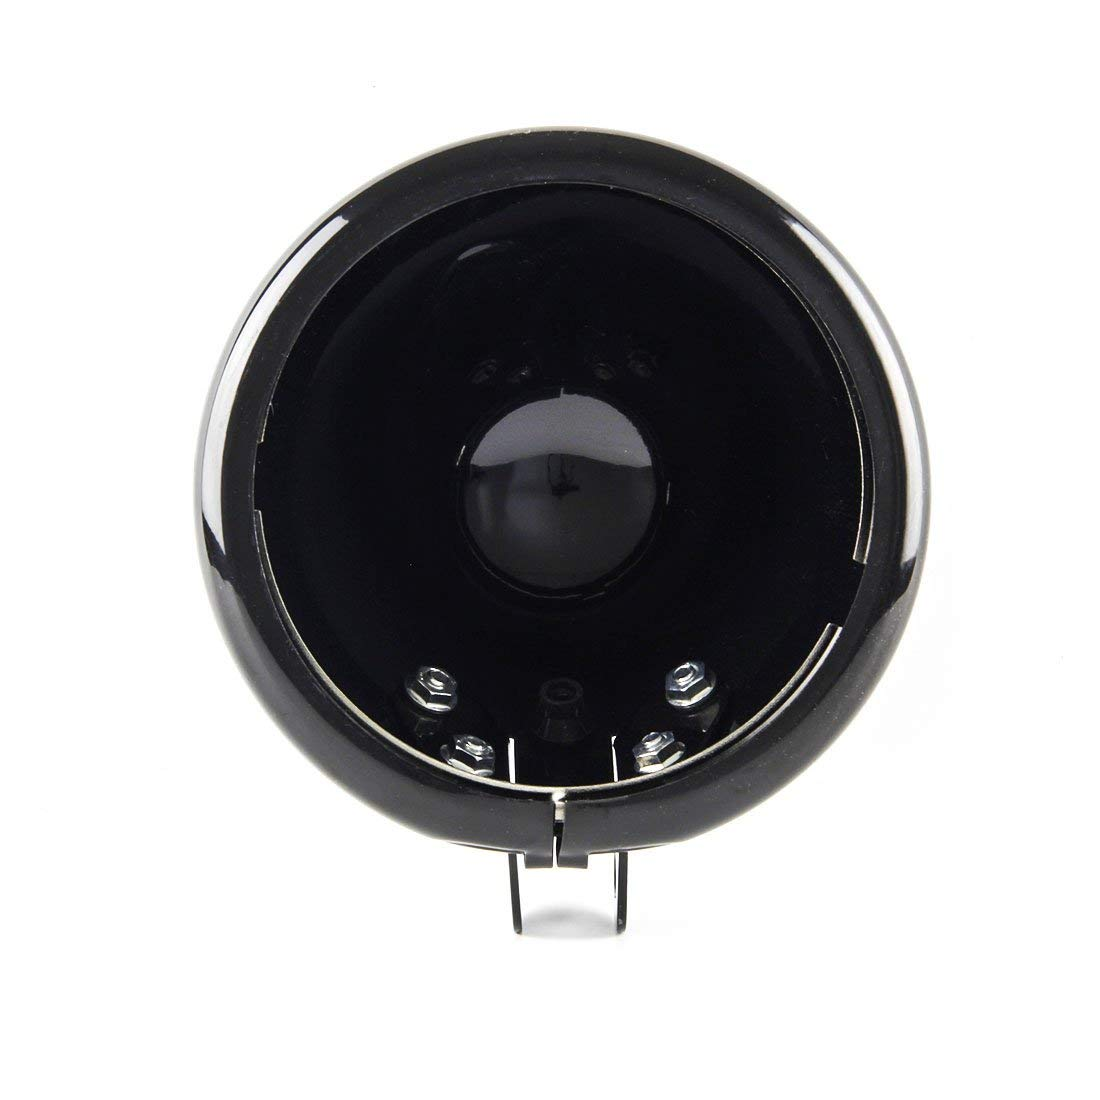 B black 5 3//4 5.75 Inch Led headlights Housing Bracket bucket for Harley Davidson motorcycle